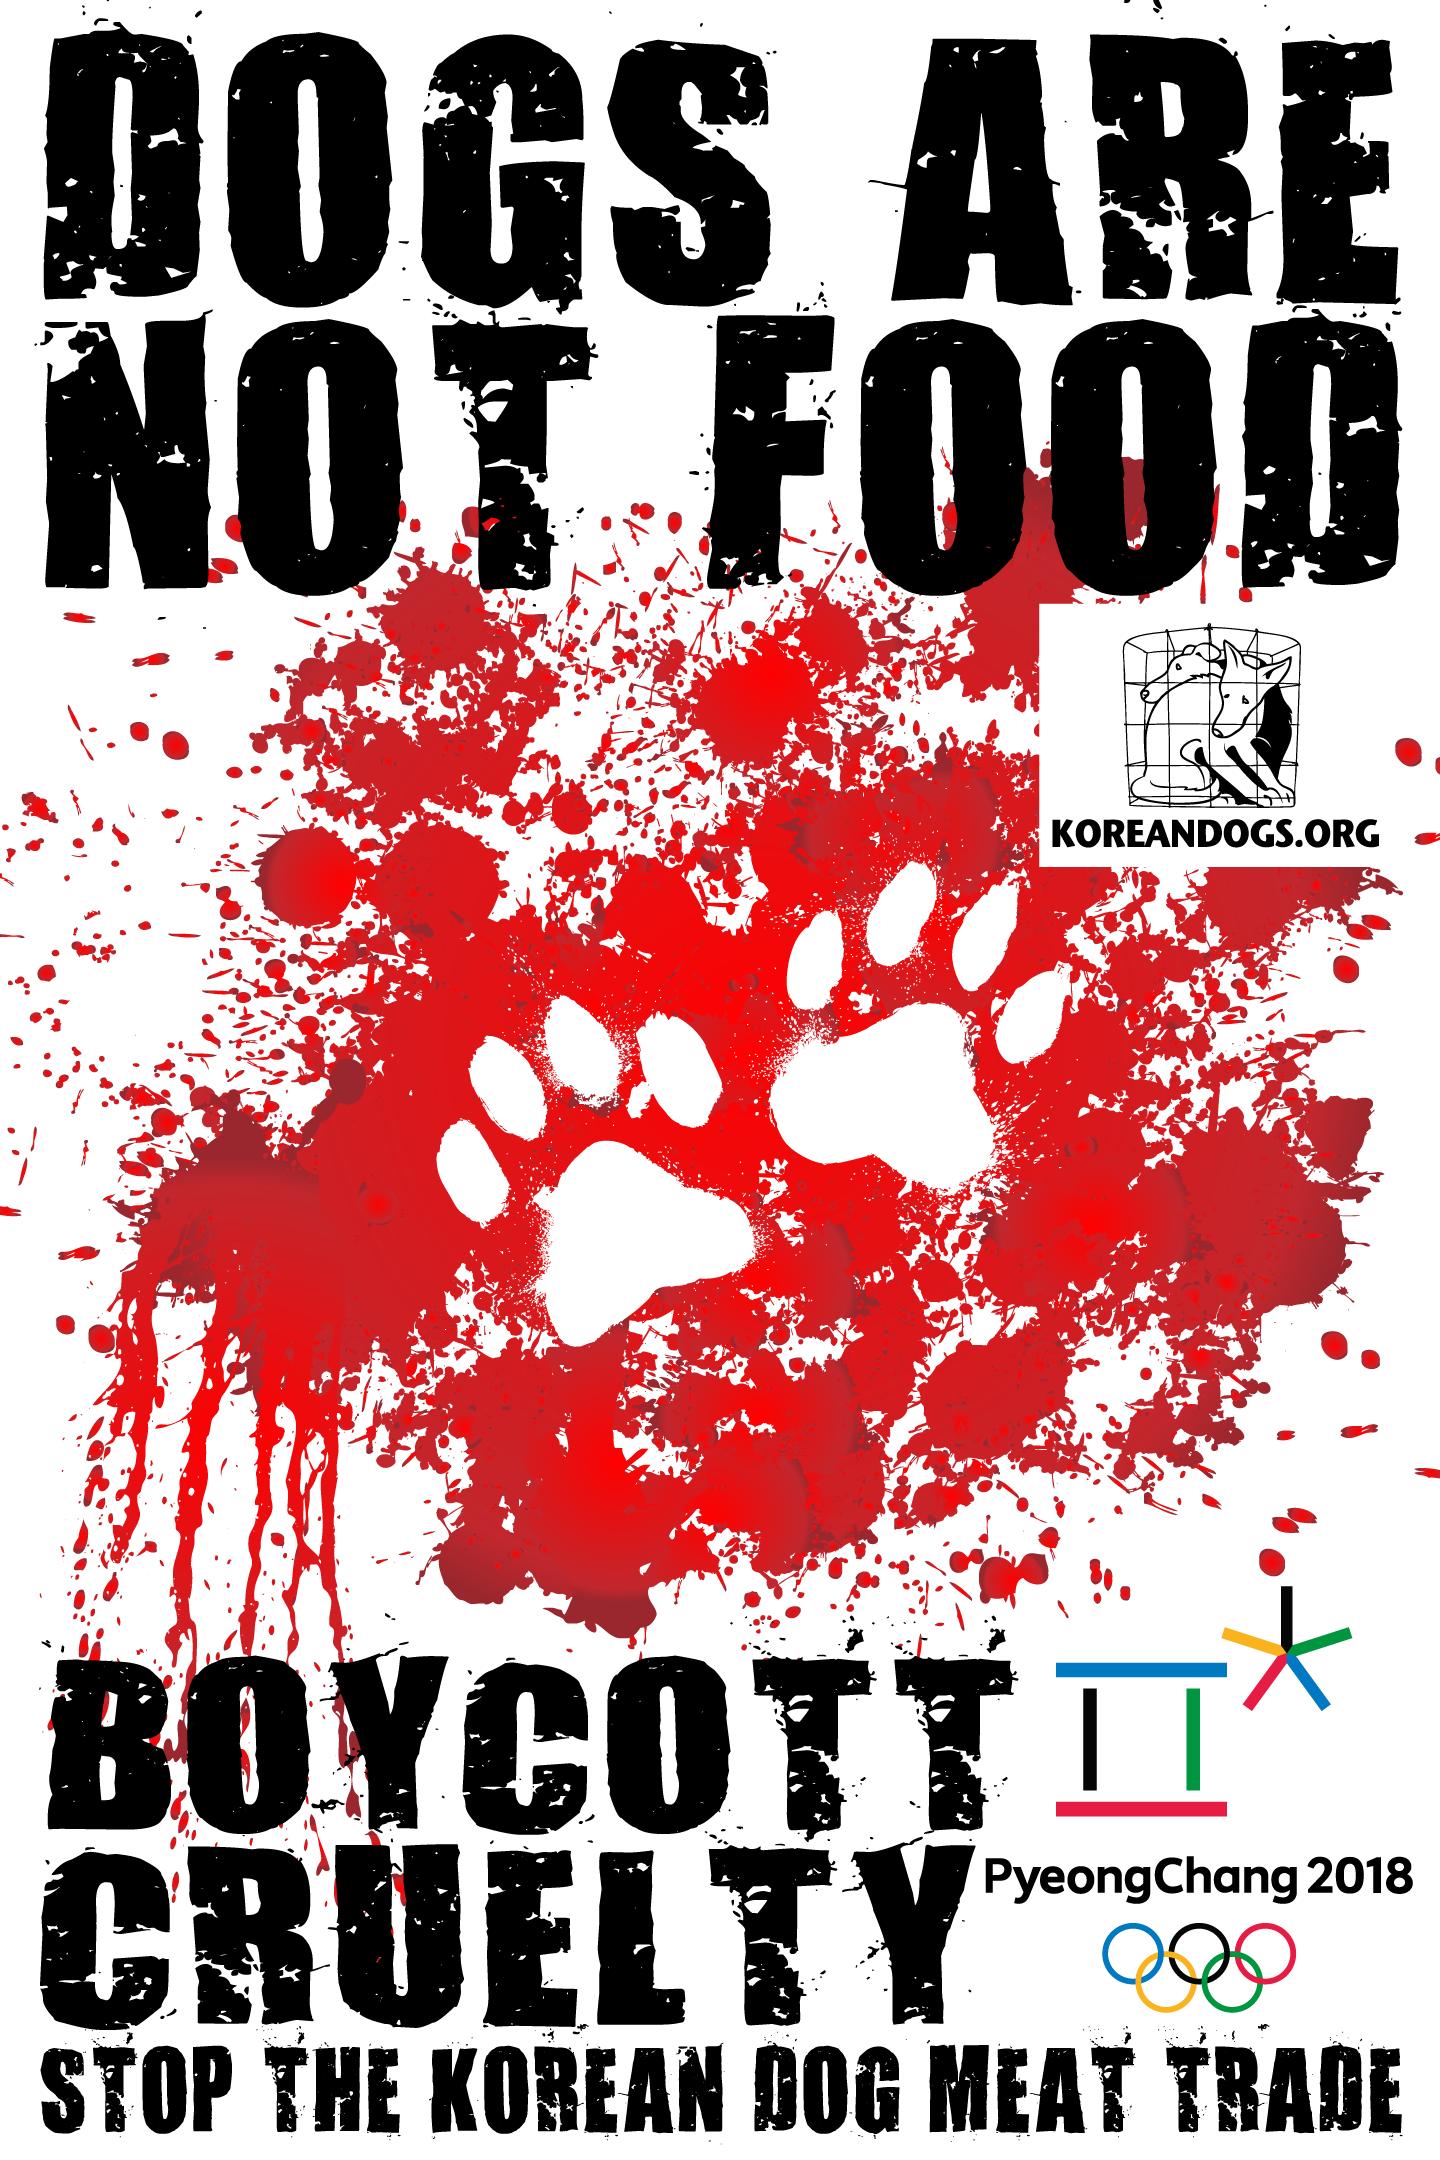 Boycott PyeongChang 2018 Action Center